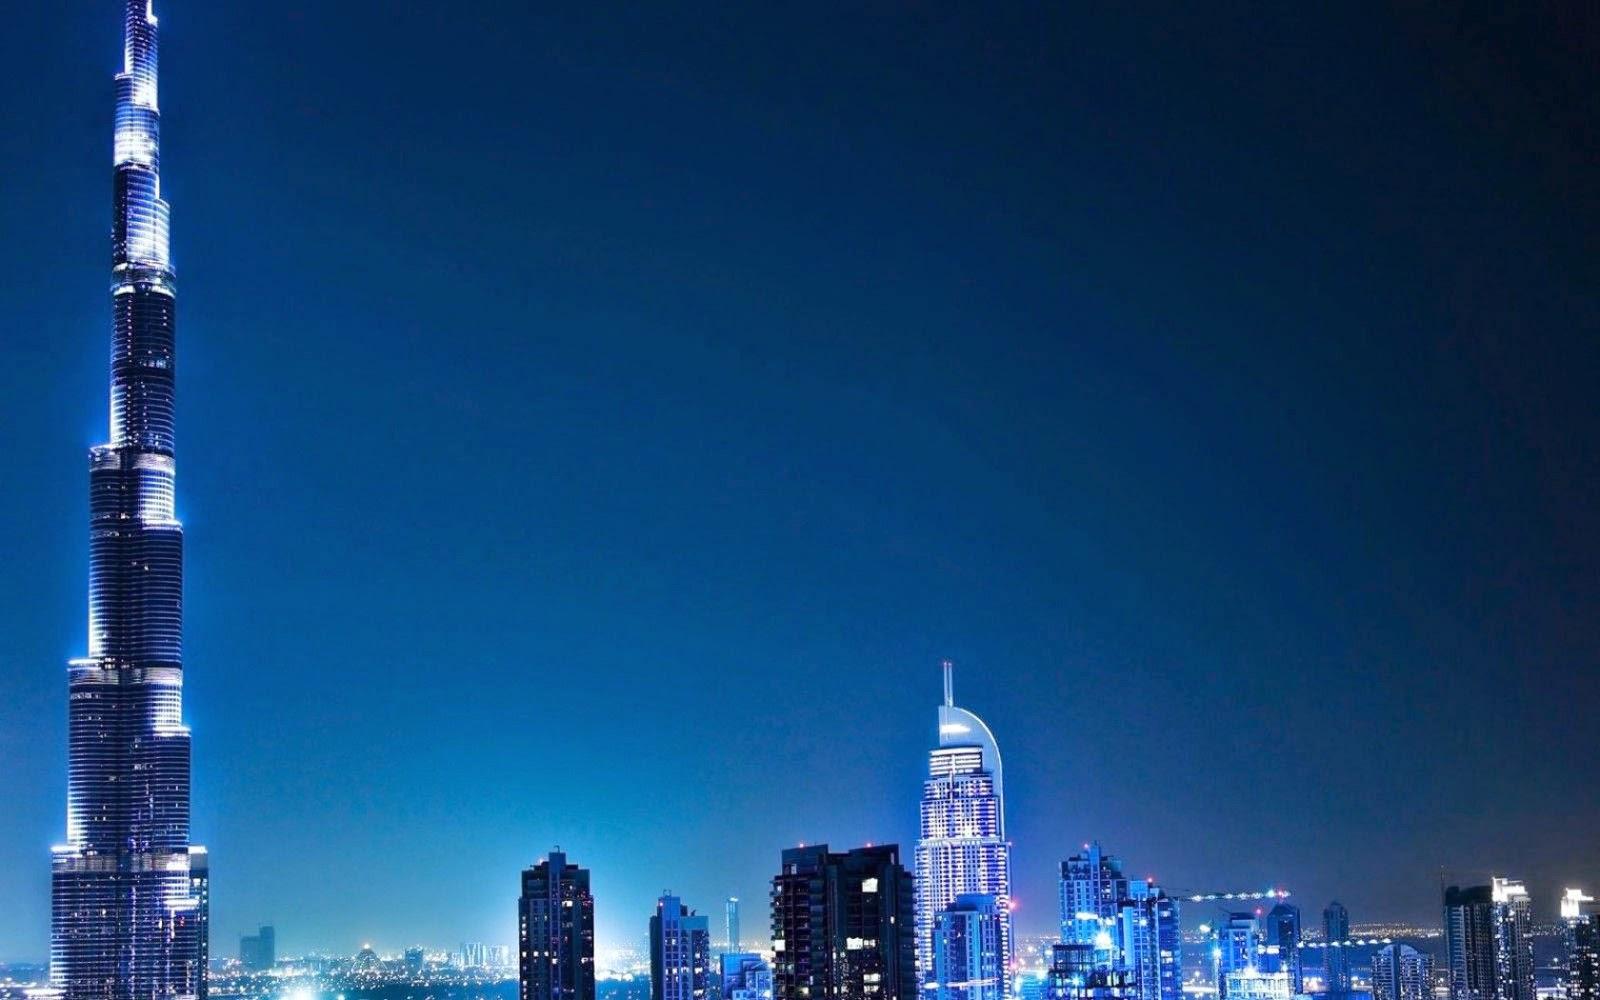 Hd wallpapers burj khalifa wallpapers at night - Dubai burj khalifa hd photos ...